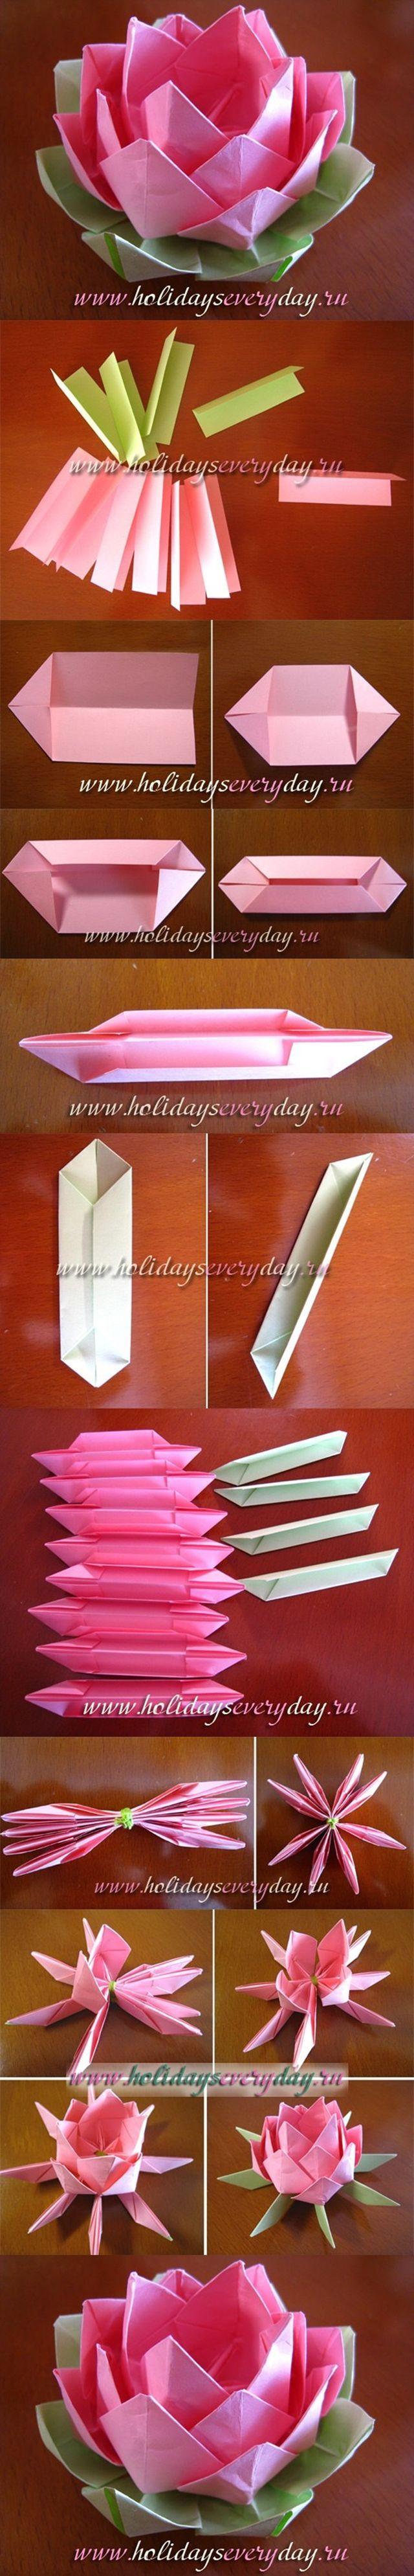 DIY Origami Paper Lotus Flower | www.FabArtDIY.com